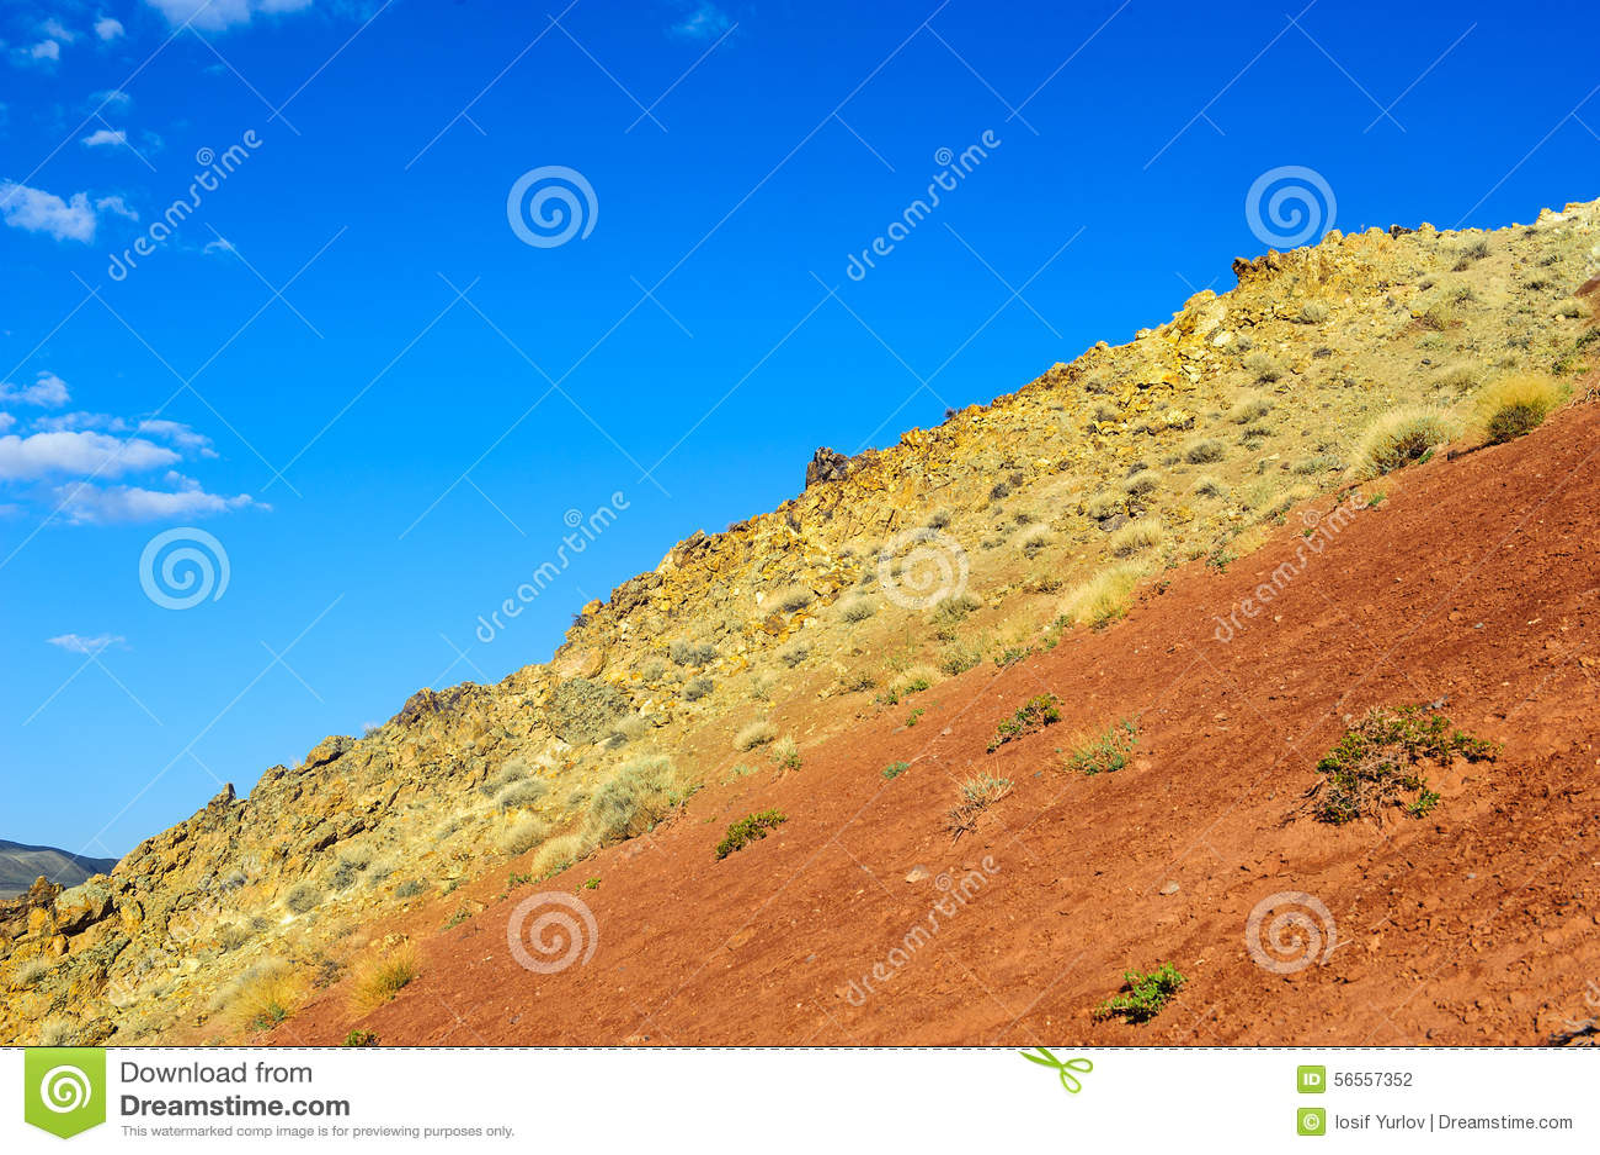 Download Χώμα χρώματος των καταθέσεων υδραργύρου σε Altai Στοκ Εικόνες - εικόνα από έρημος, χρώμα: 56557352